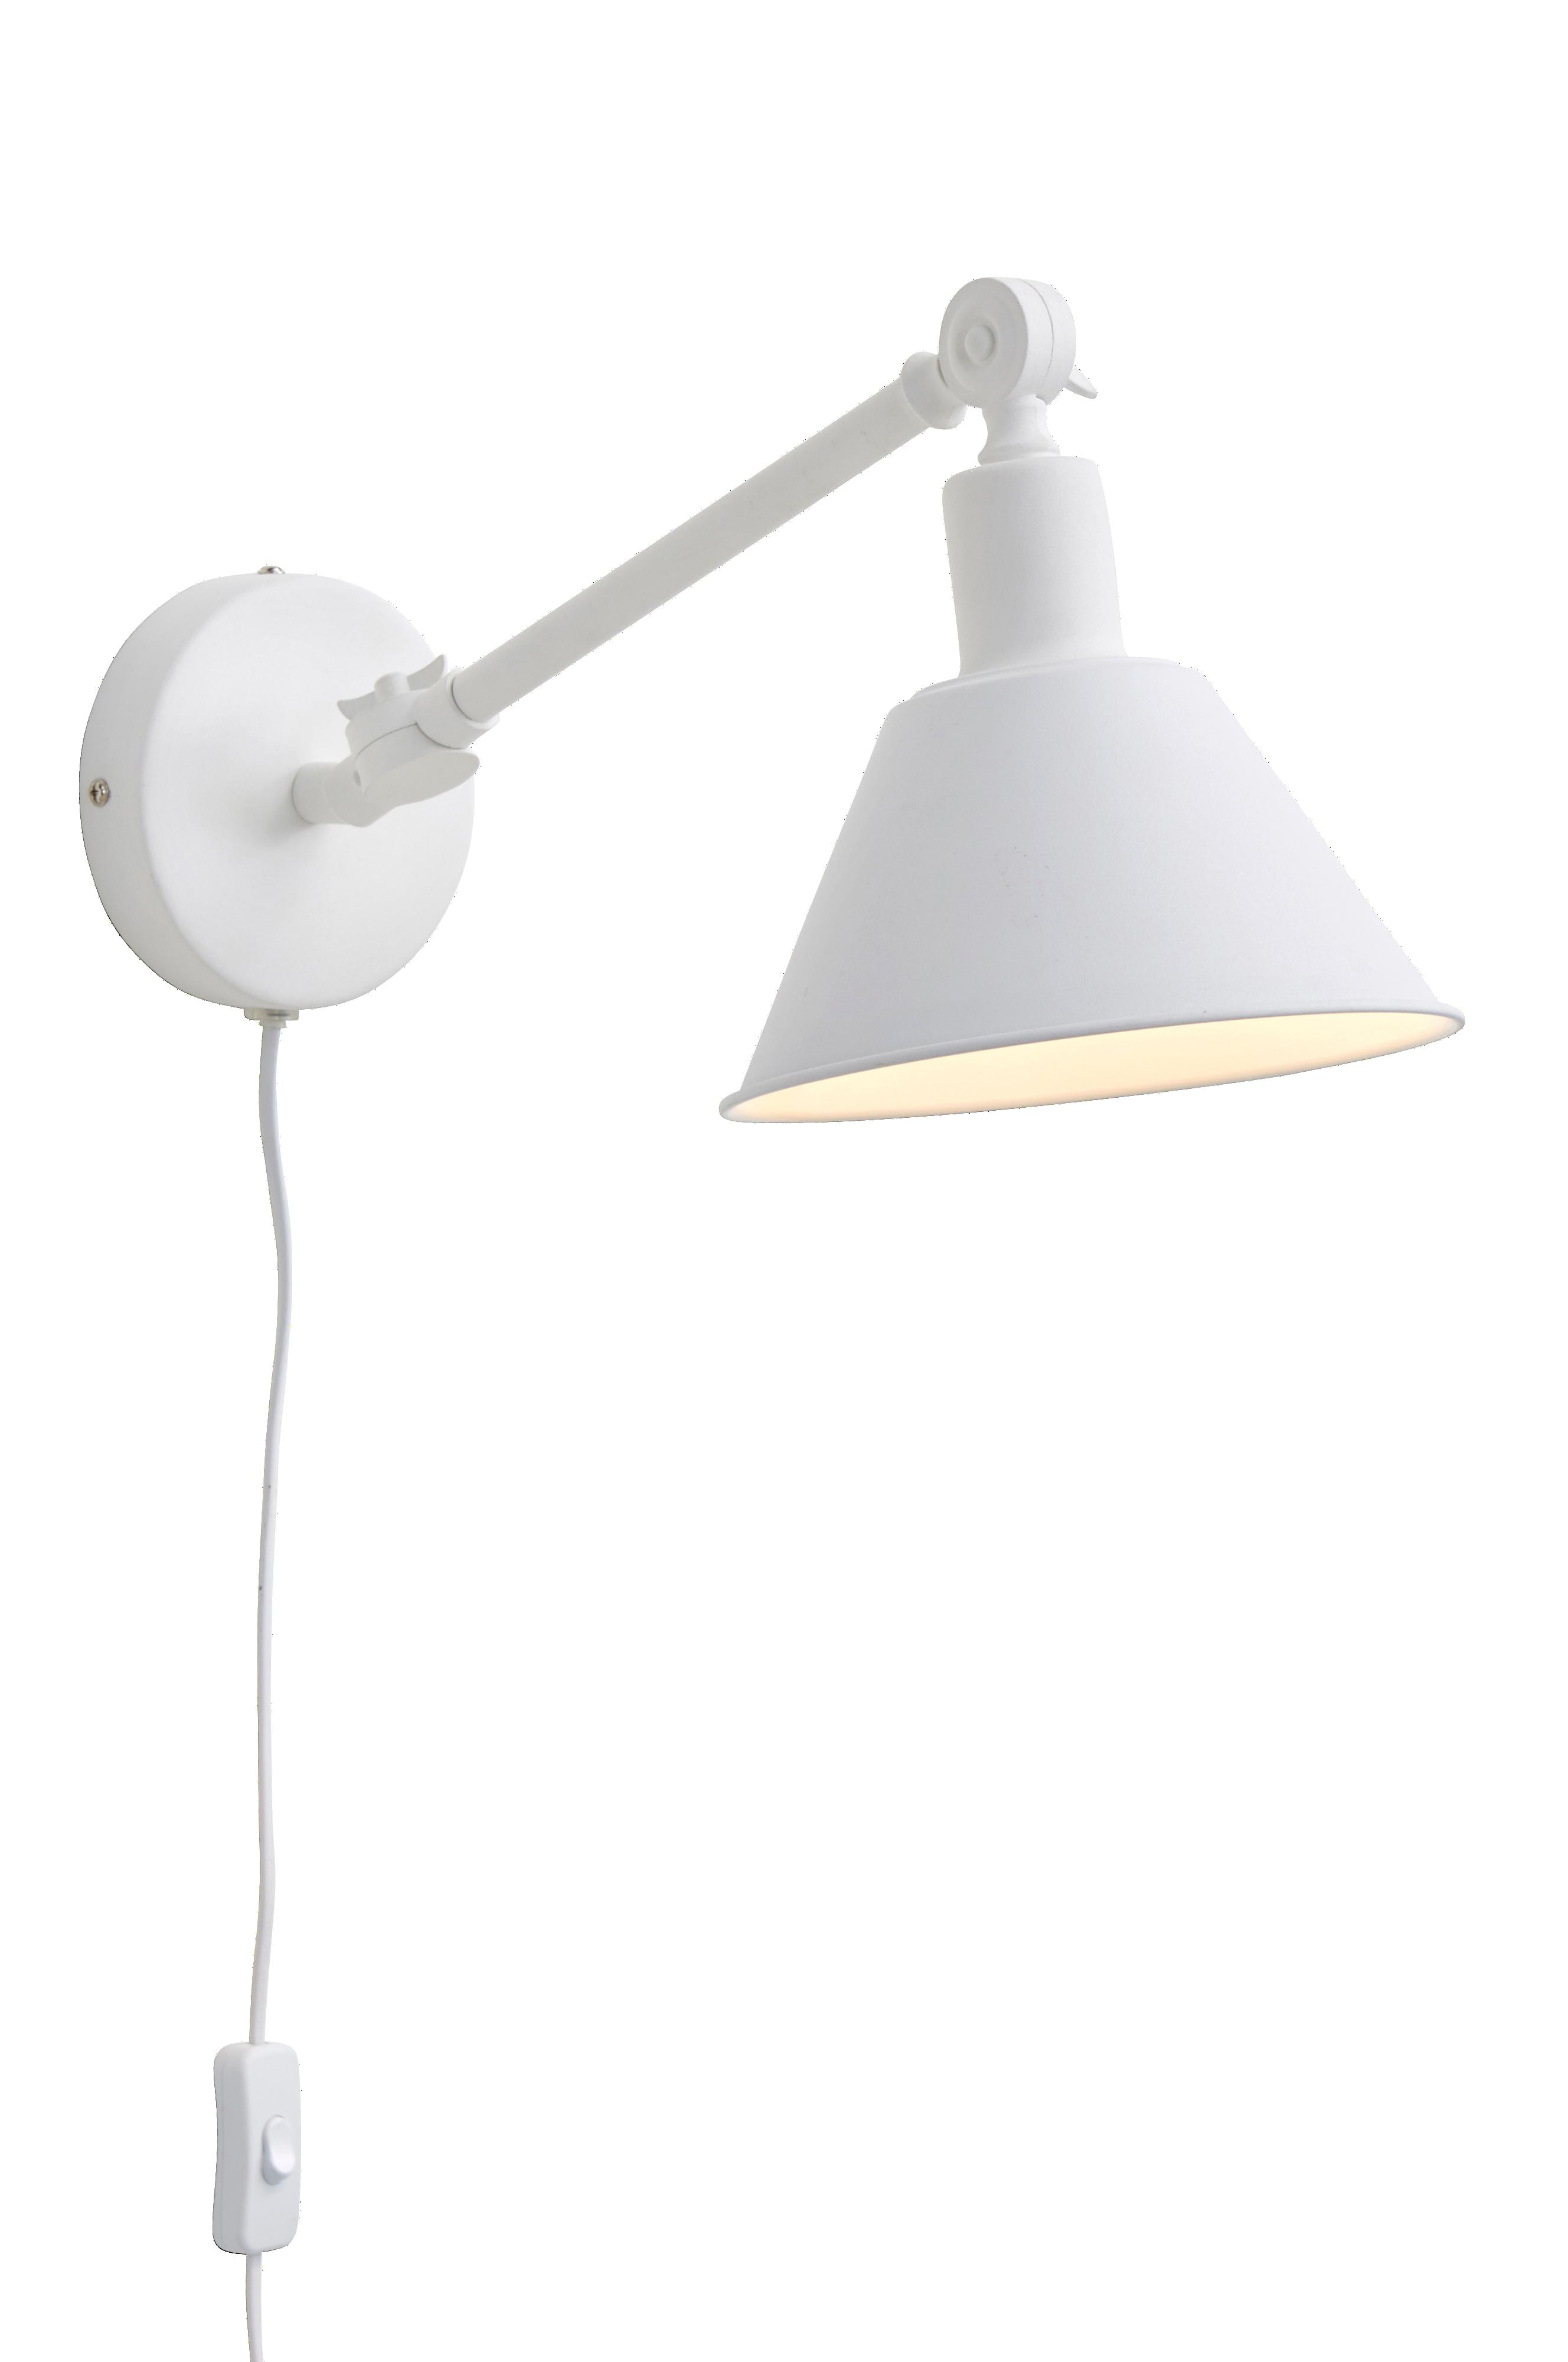 Ellos Home Vegglampe Oxford Svart Vegglamper Ellos.no